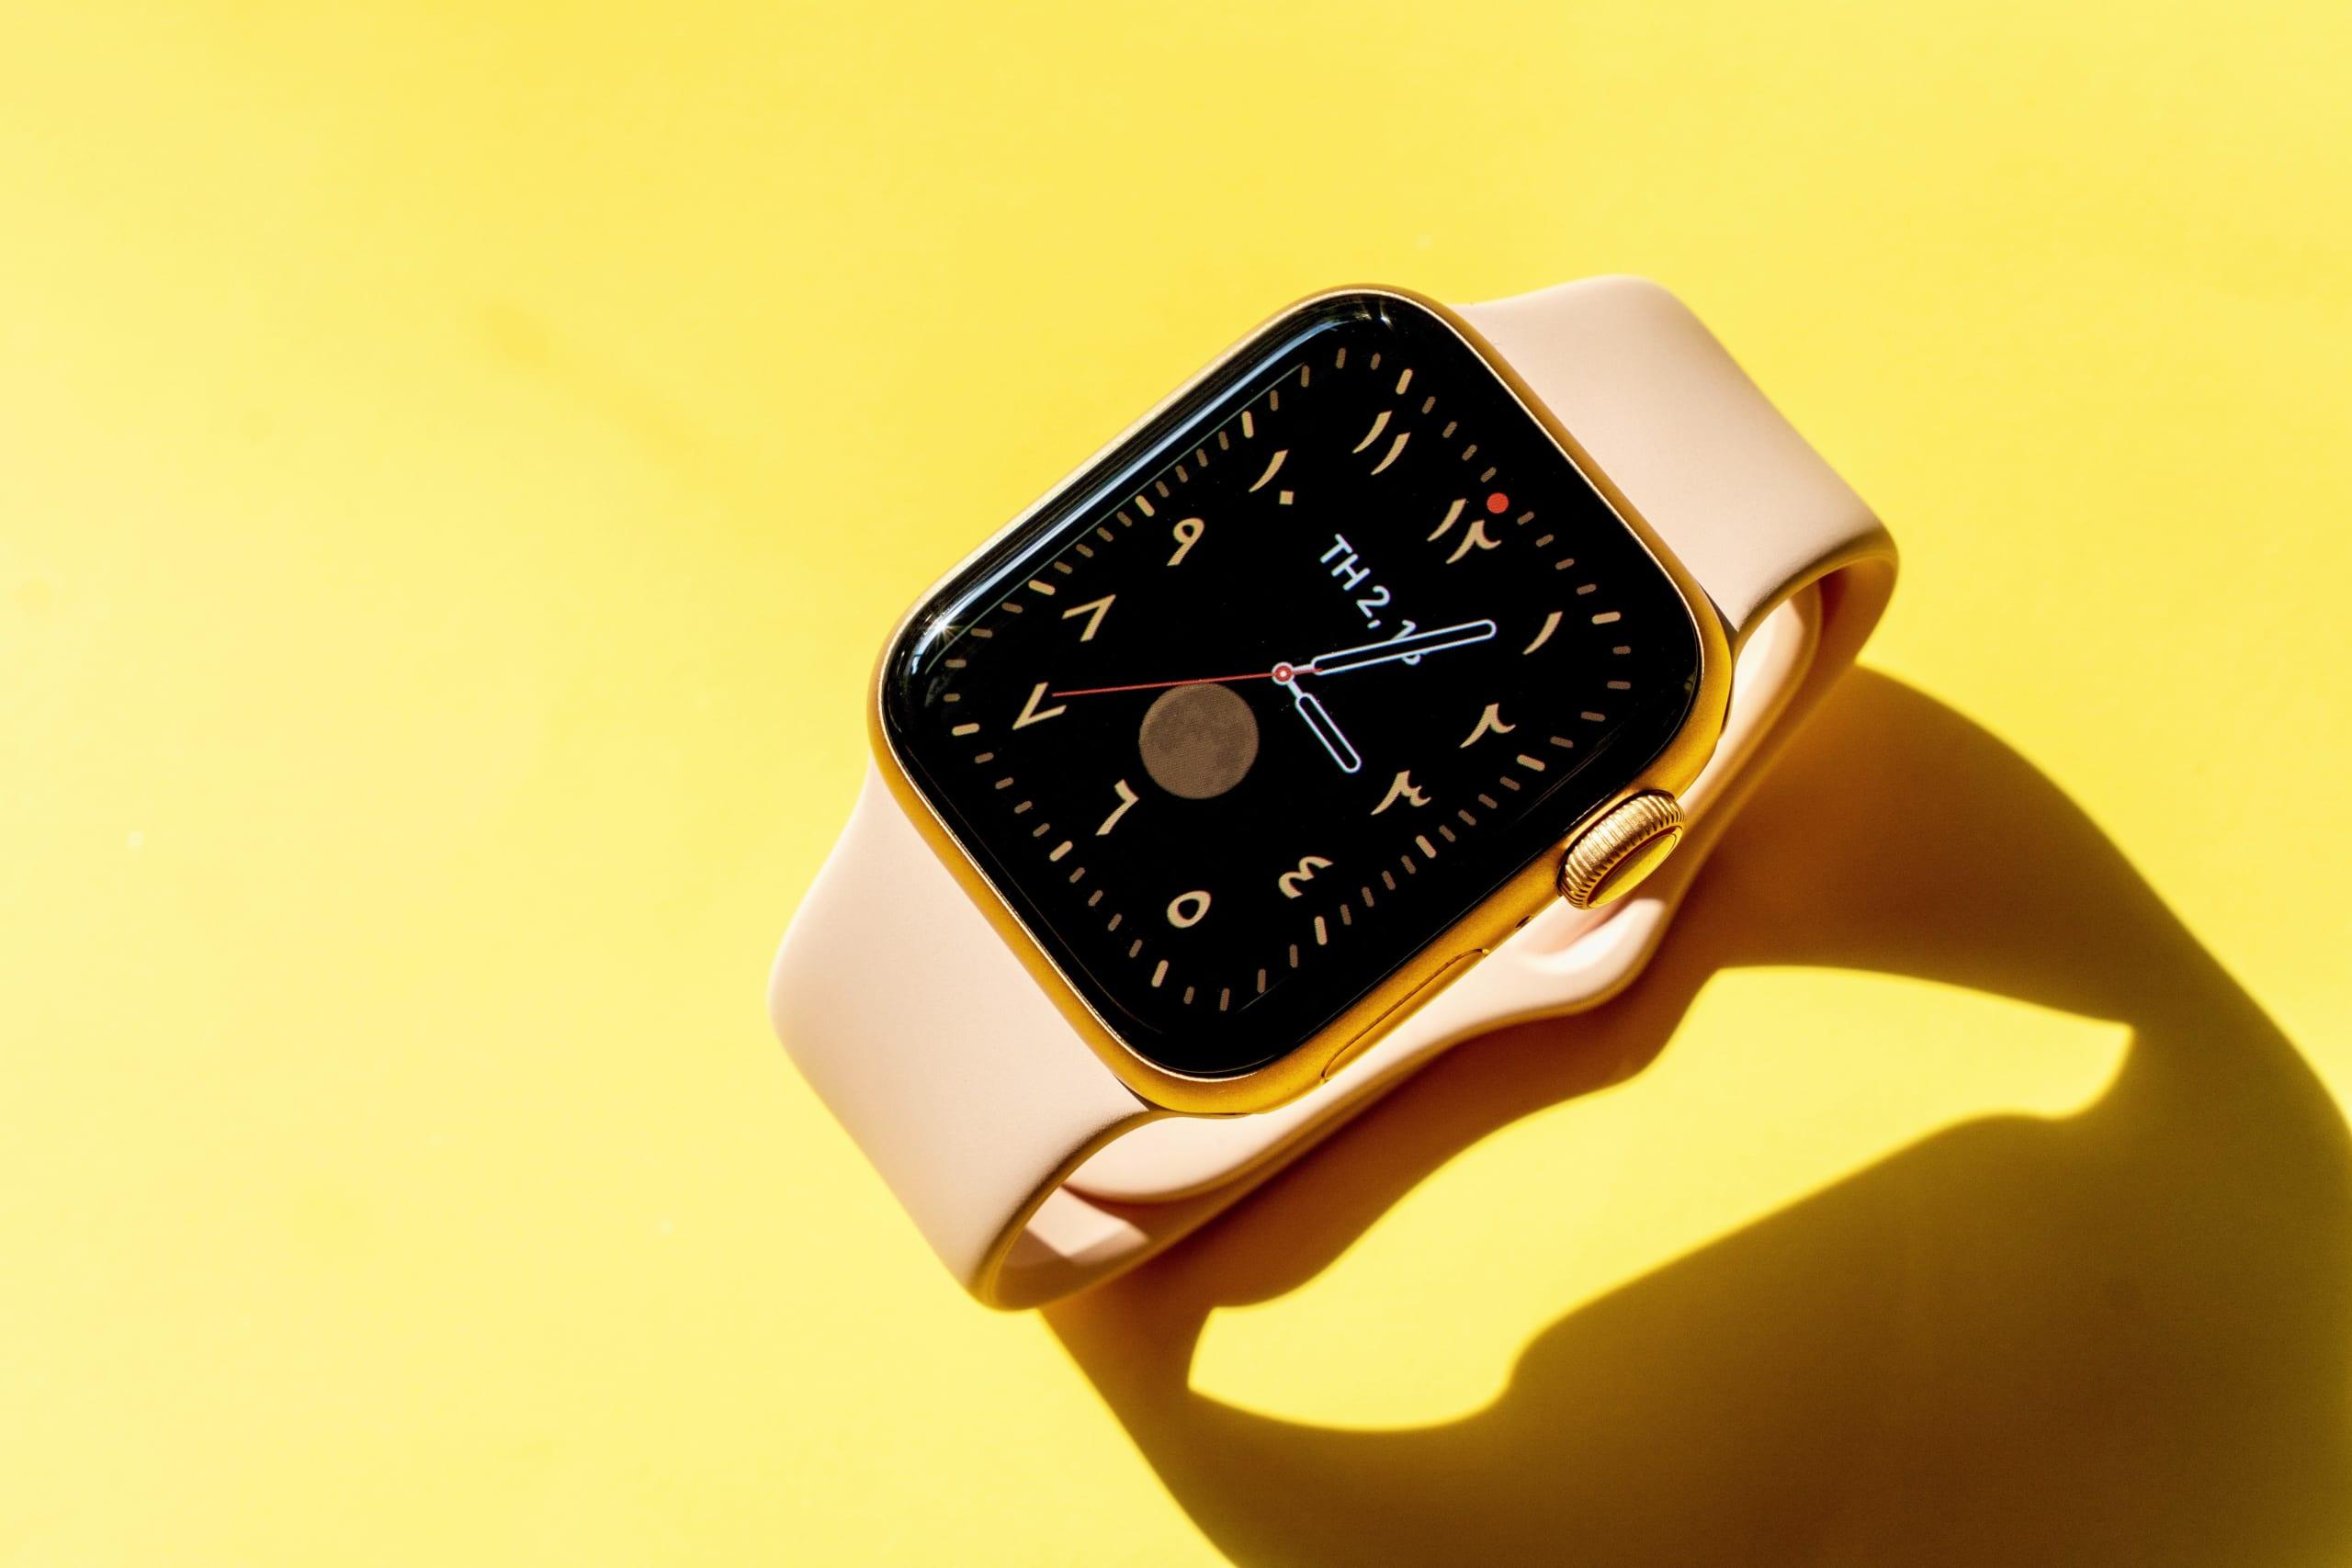 Apple Watchが必要な人と必要ない人の違いとは?使える便利機能を徹底解説